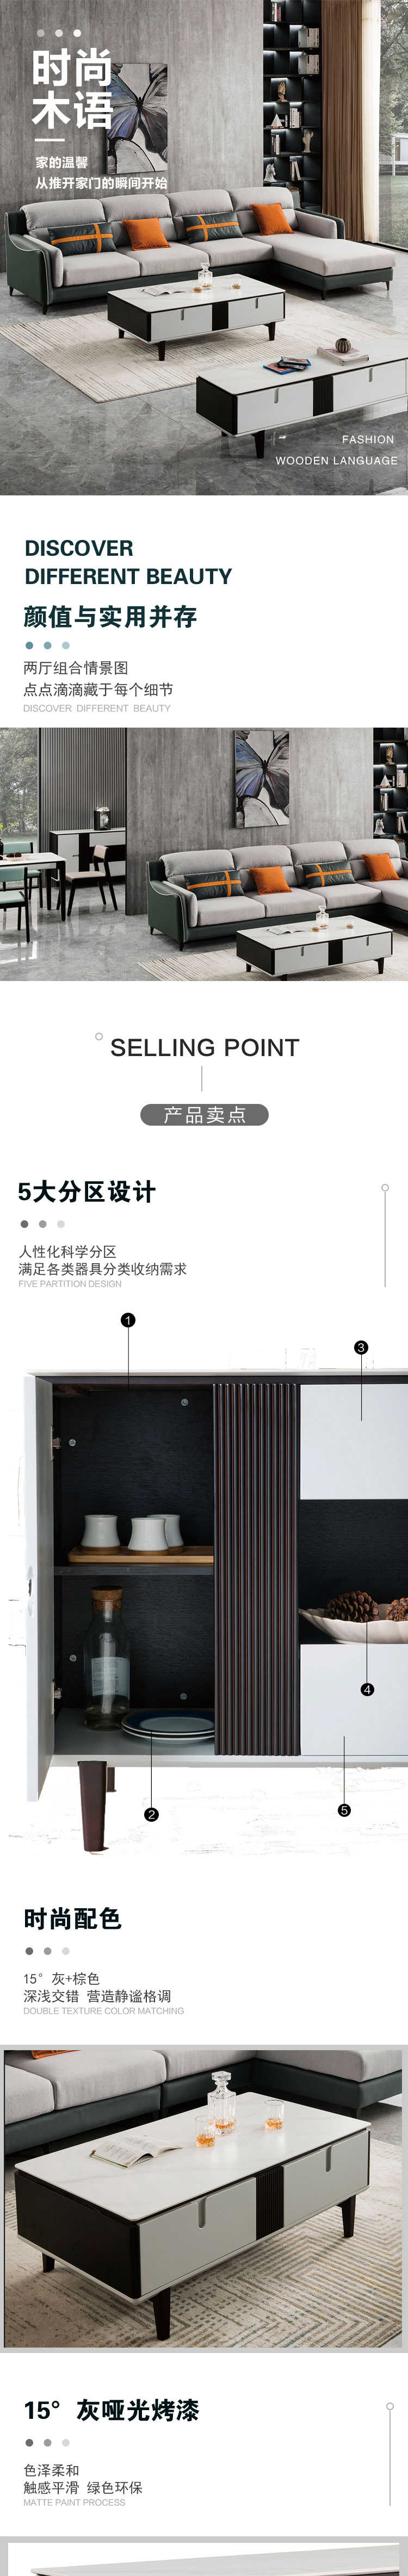 LS102餐邊柜_01.jpg